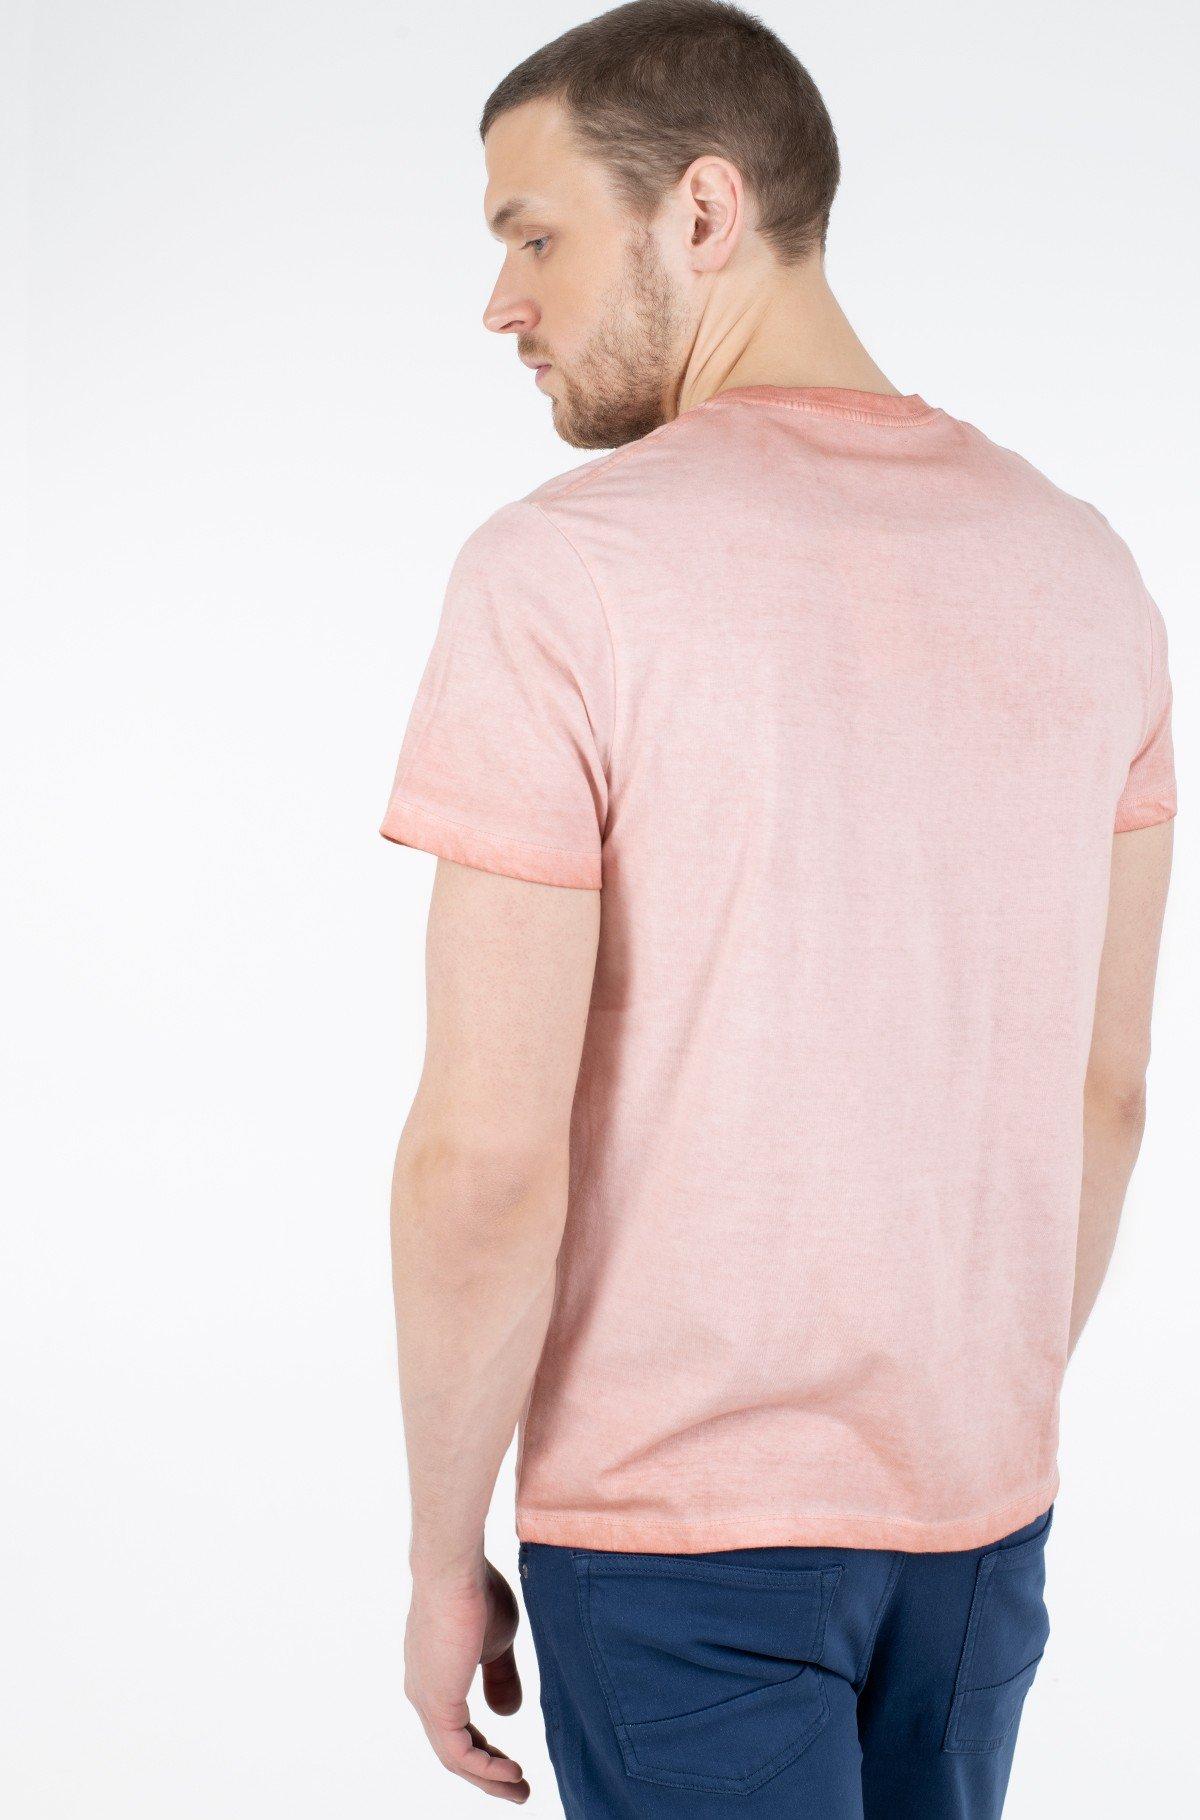 T-shirt WEST SIR/PM504032-full-2